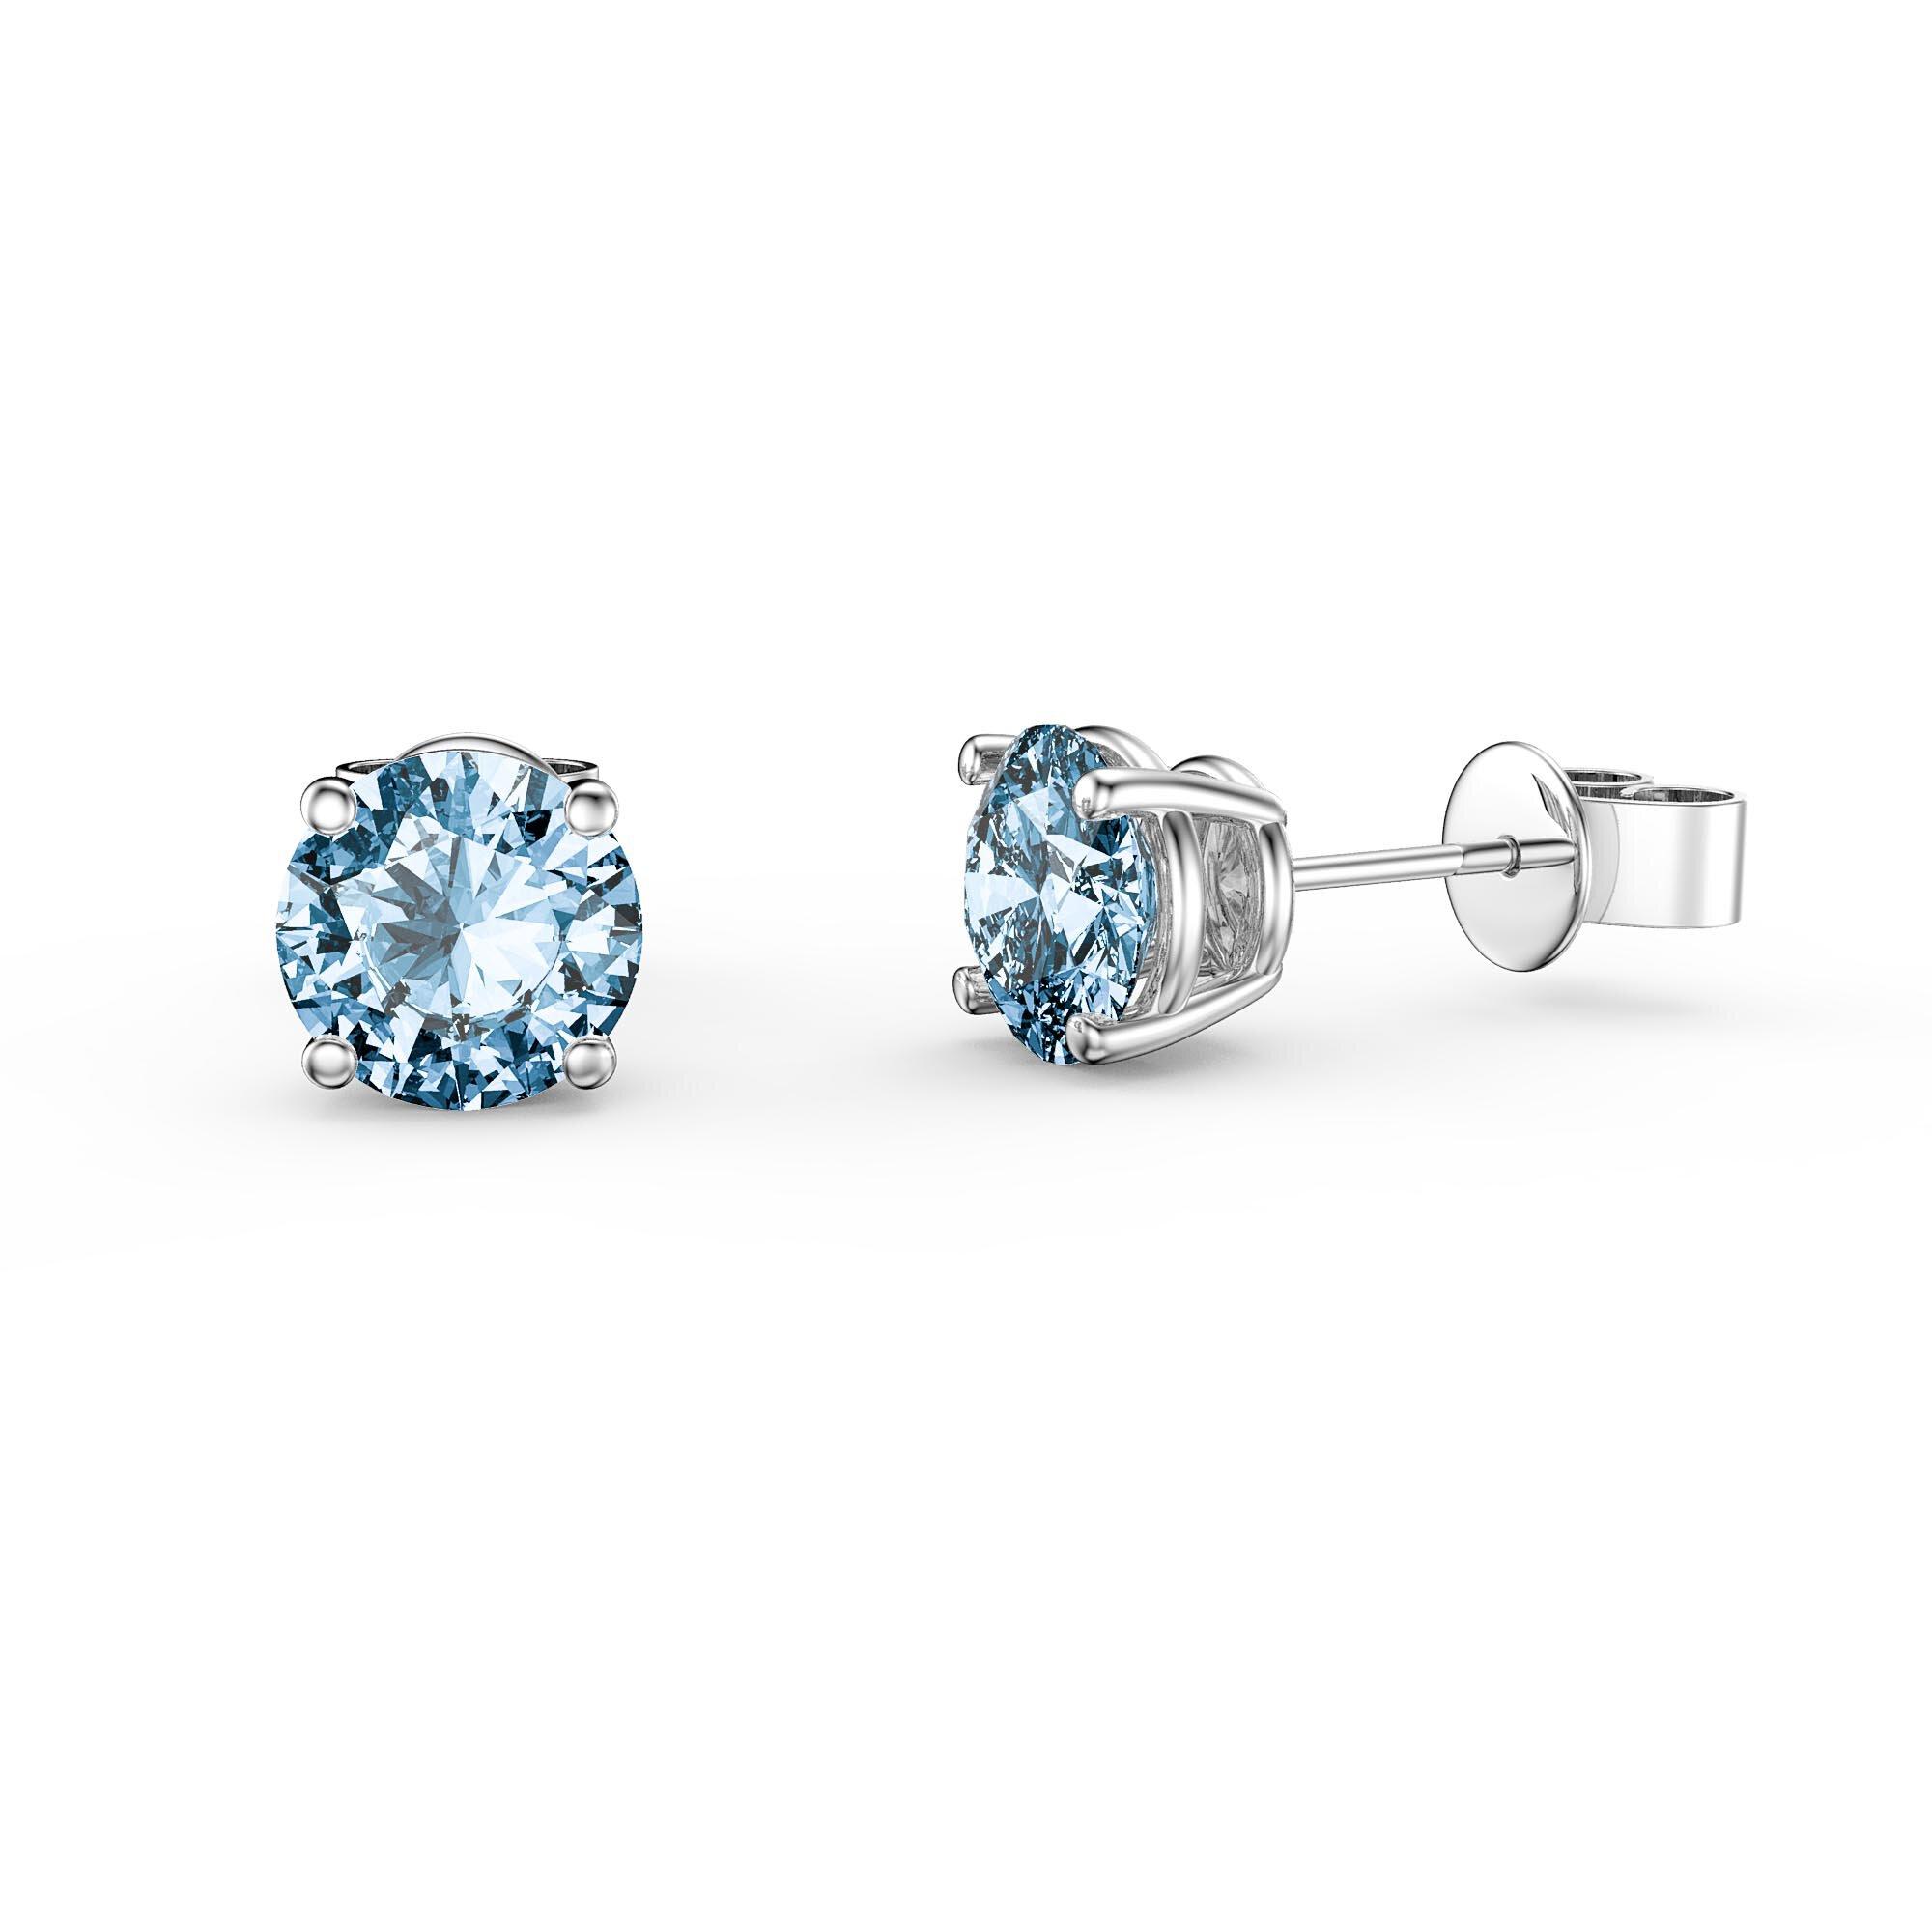 8075064858245 Charmisma 1ct Swiss Blue Topaz 9ct White Gold Stud Earrings